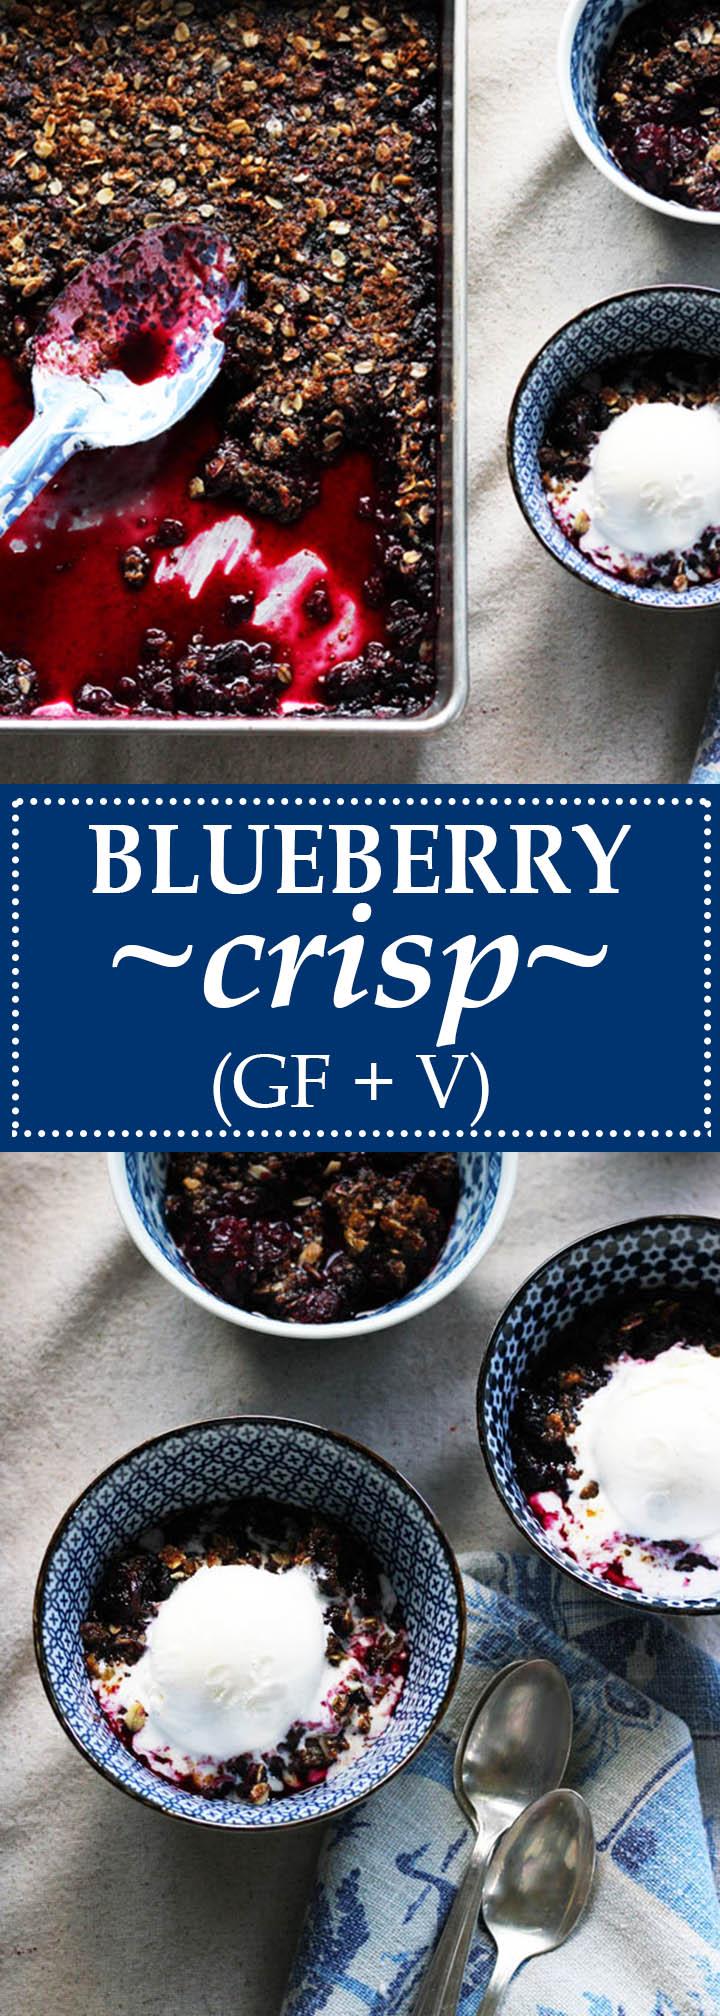 Blueberry-Crisp--GF-+-V | www.thetableofcontents.co